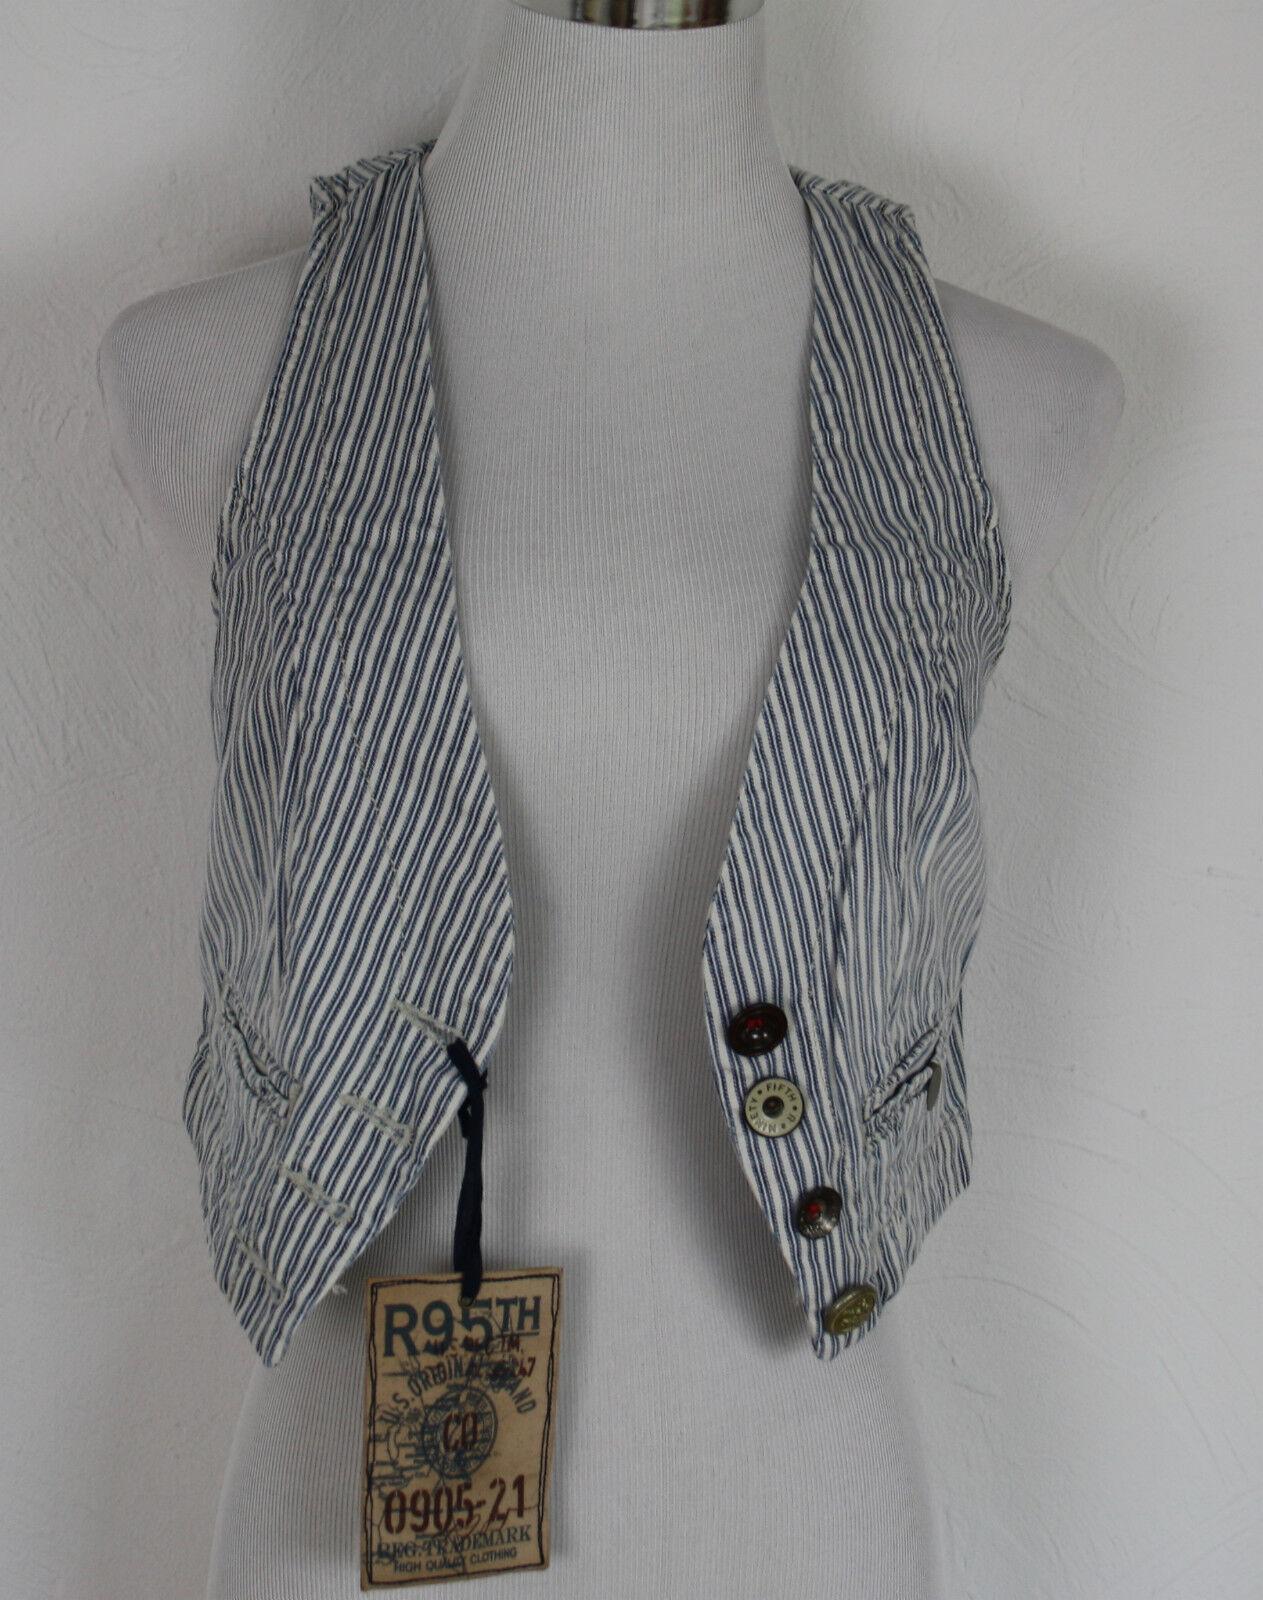 R95th Vest Gilet Denim bluee White Striped